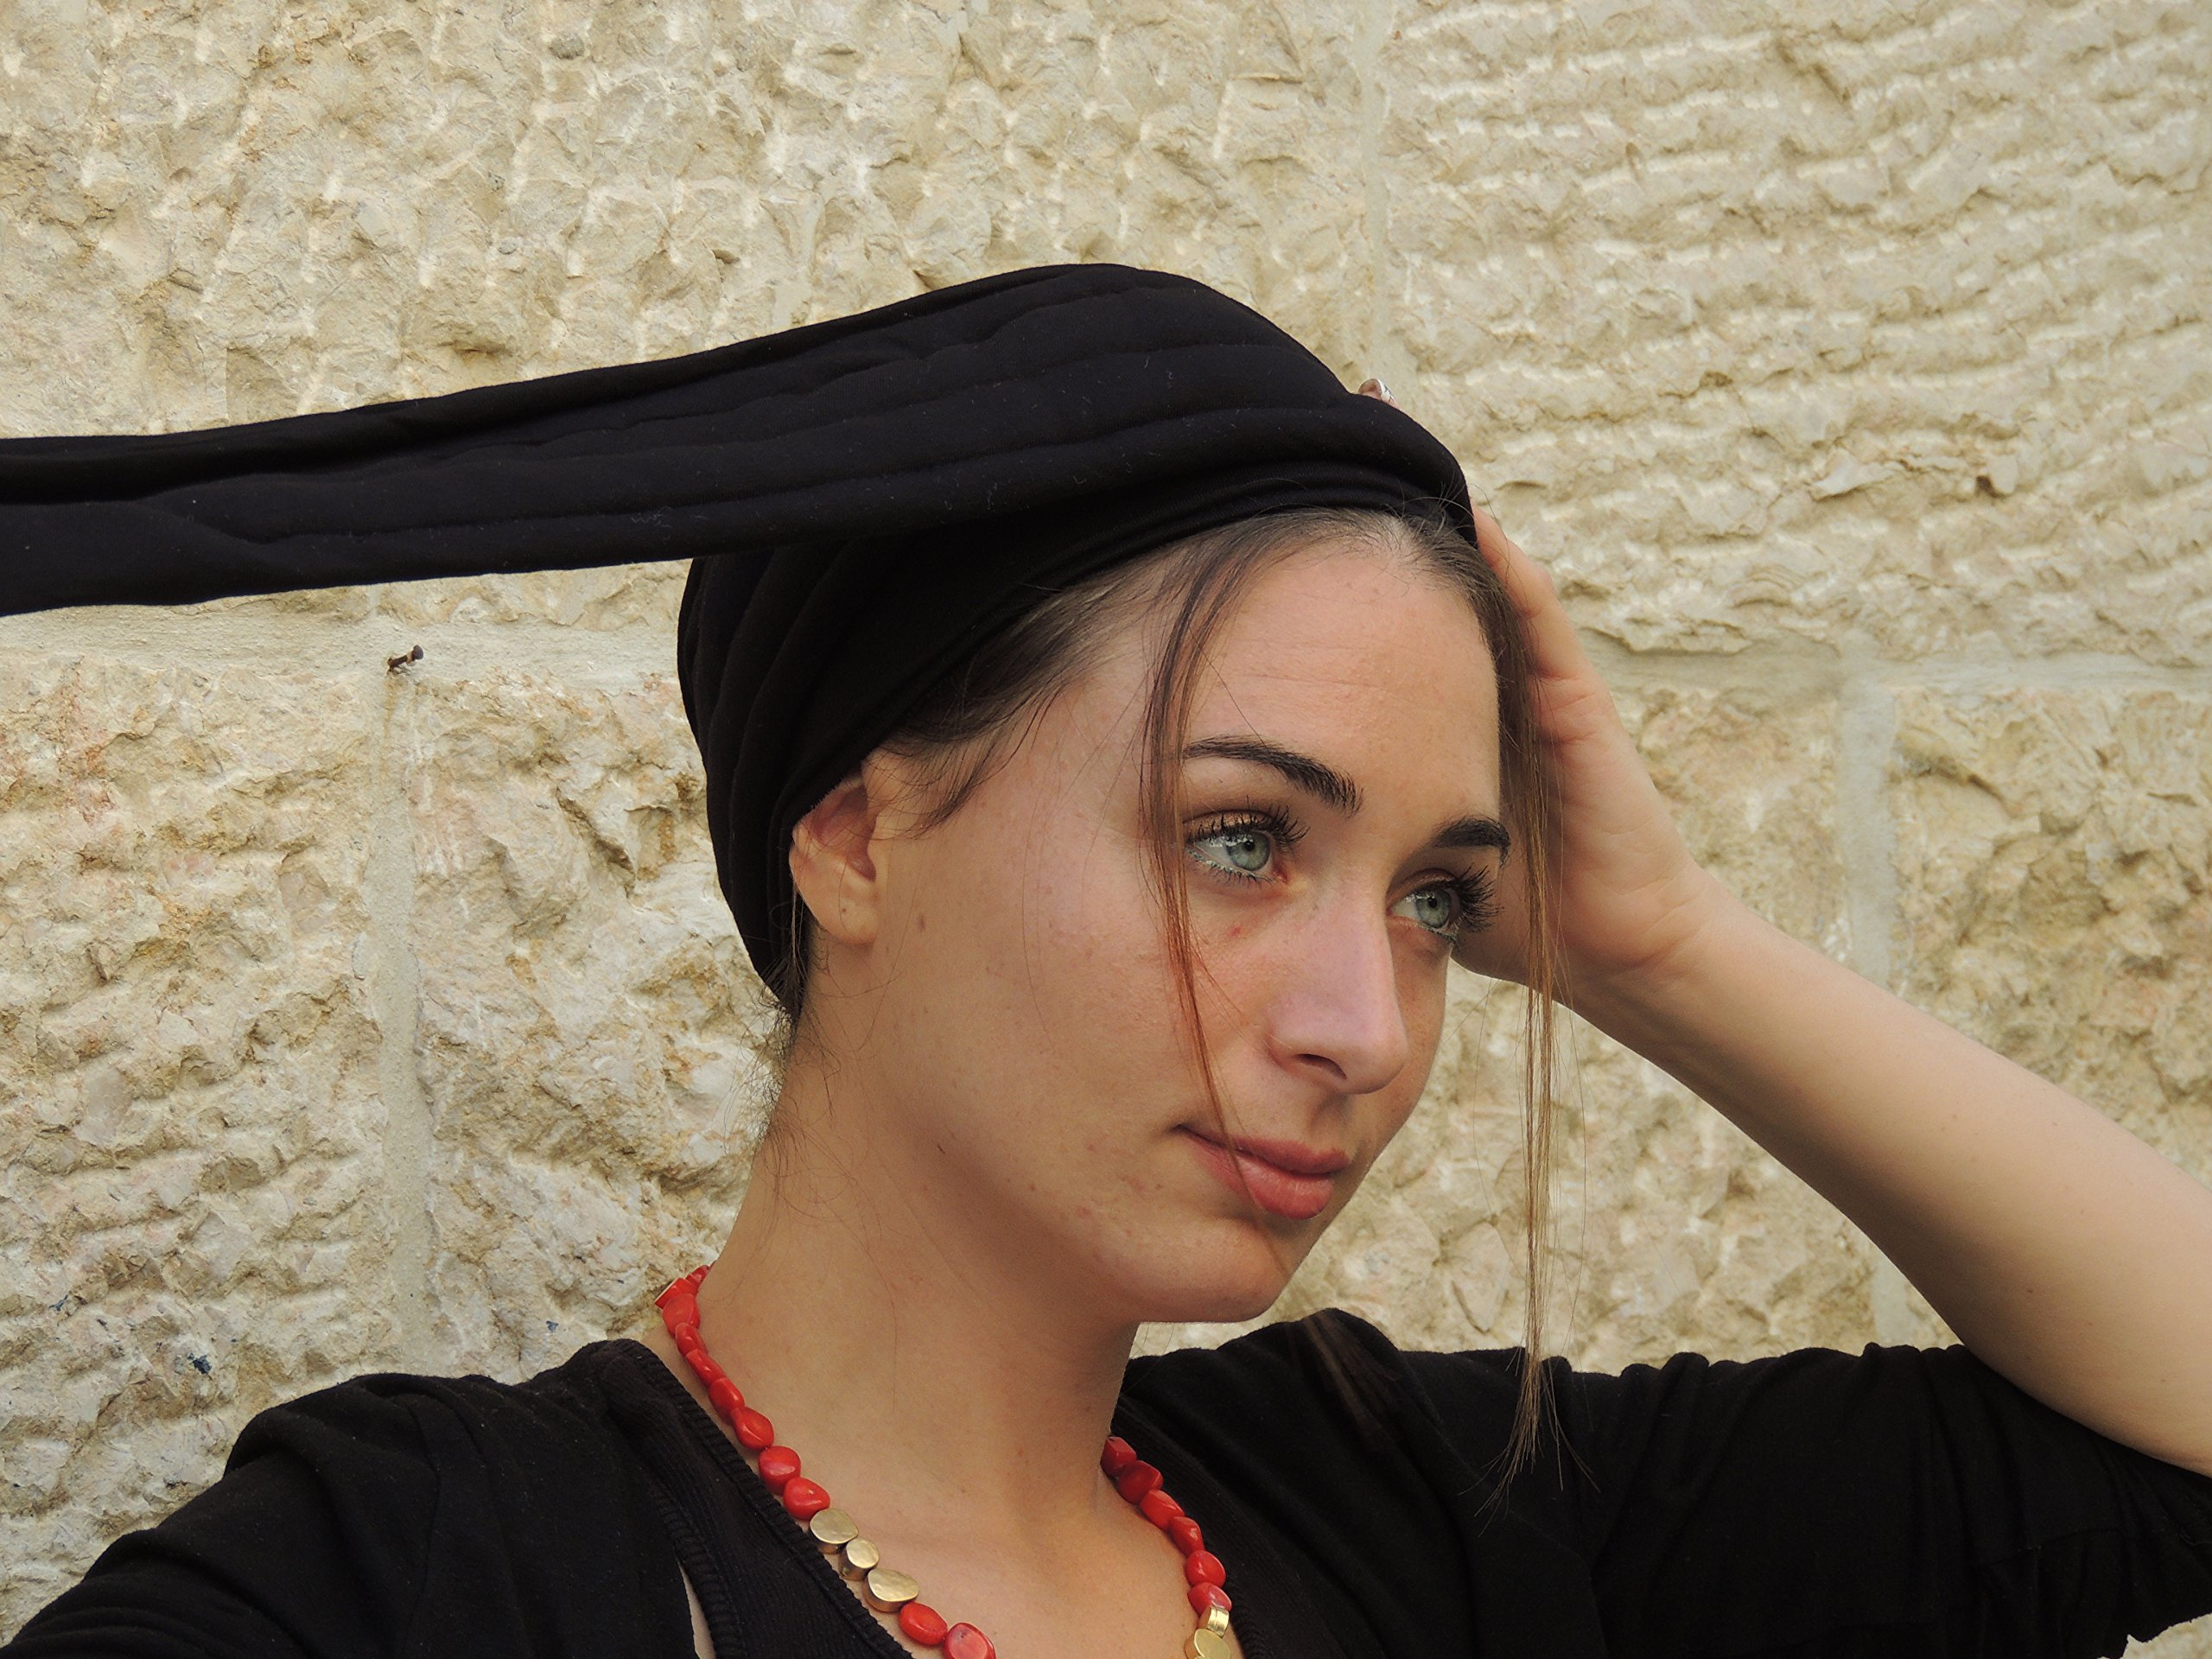 Sara Attali Design Tichel Volumizer Head Scarves, Chemo Volumizing Super Plus Black by Sara Attali Design (Image #5)